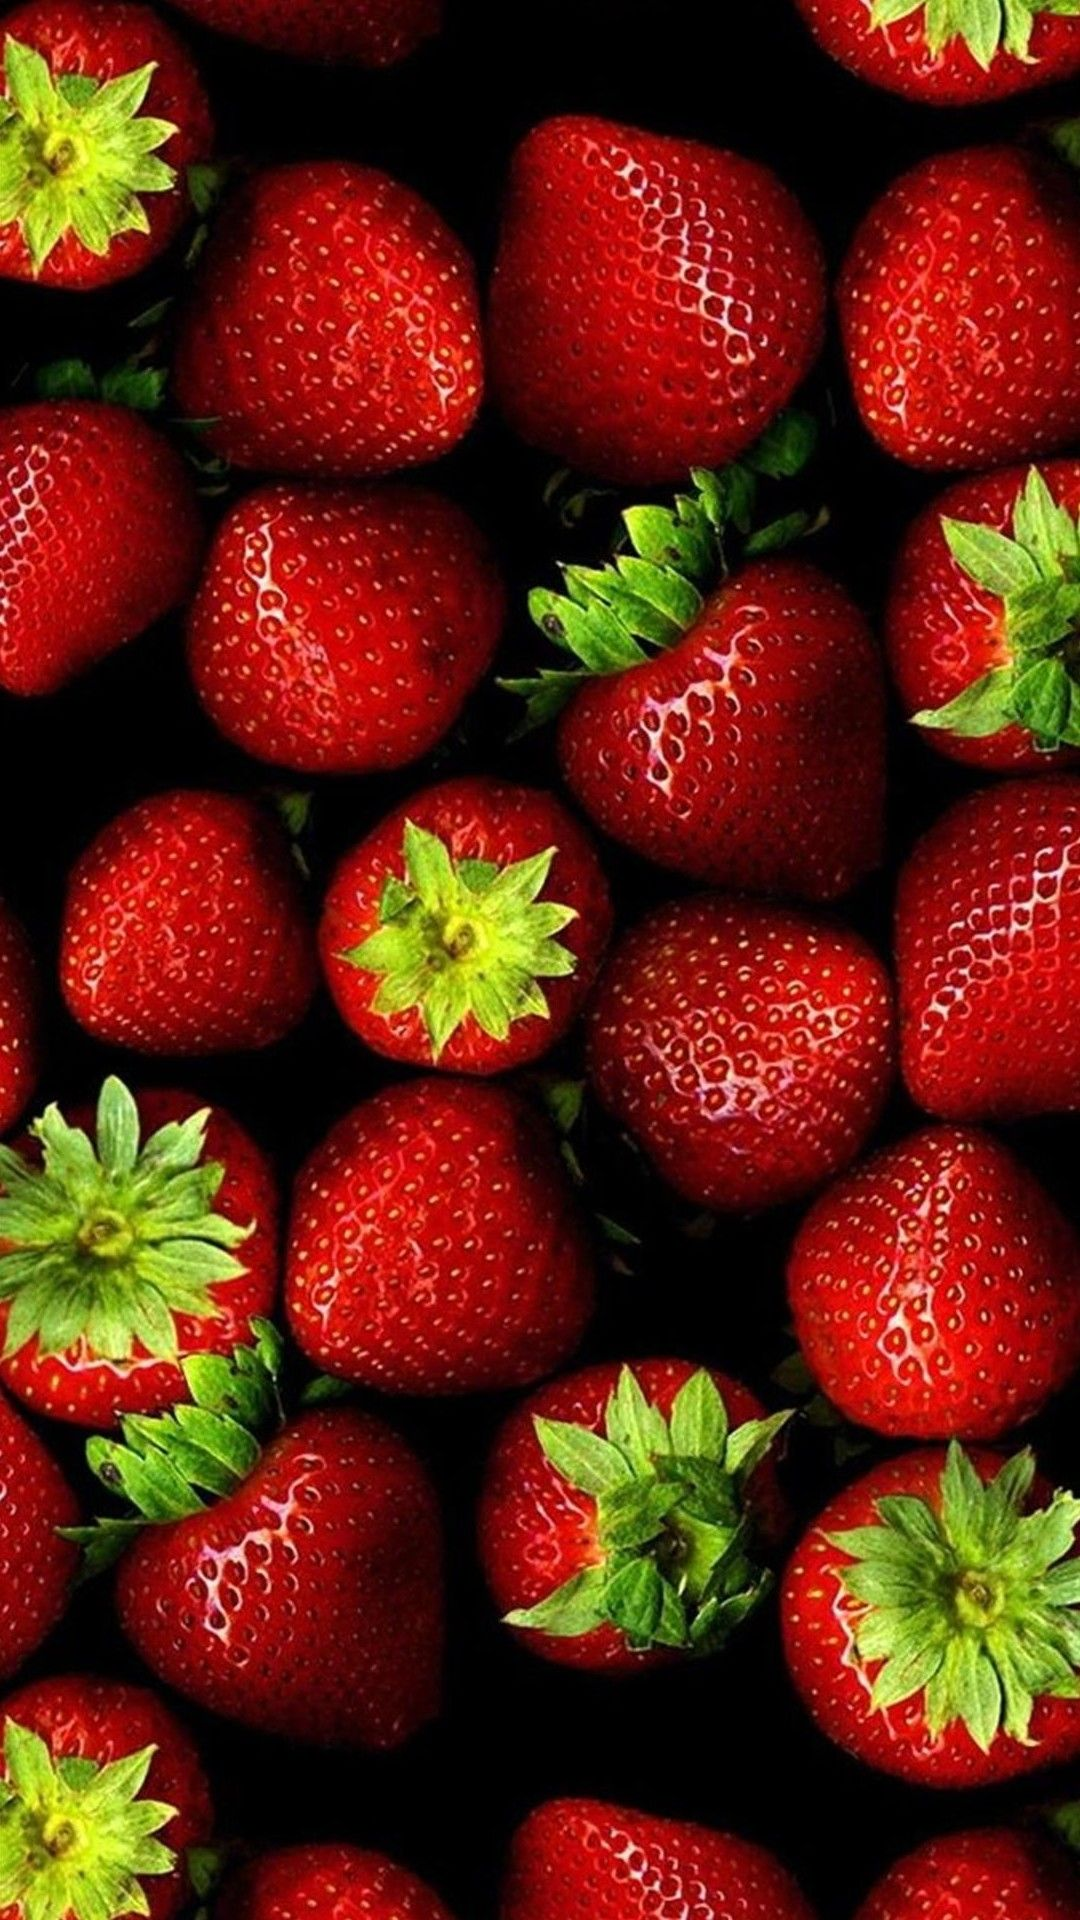 Download Fresh Strawberries Lockscreen iPhone 6 Plus HD